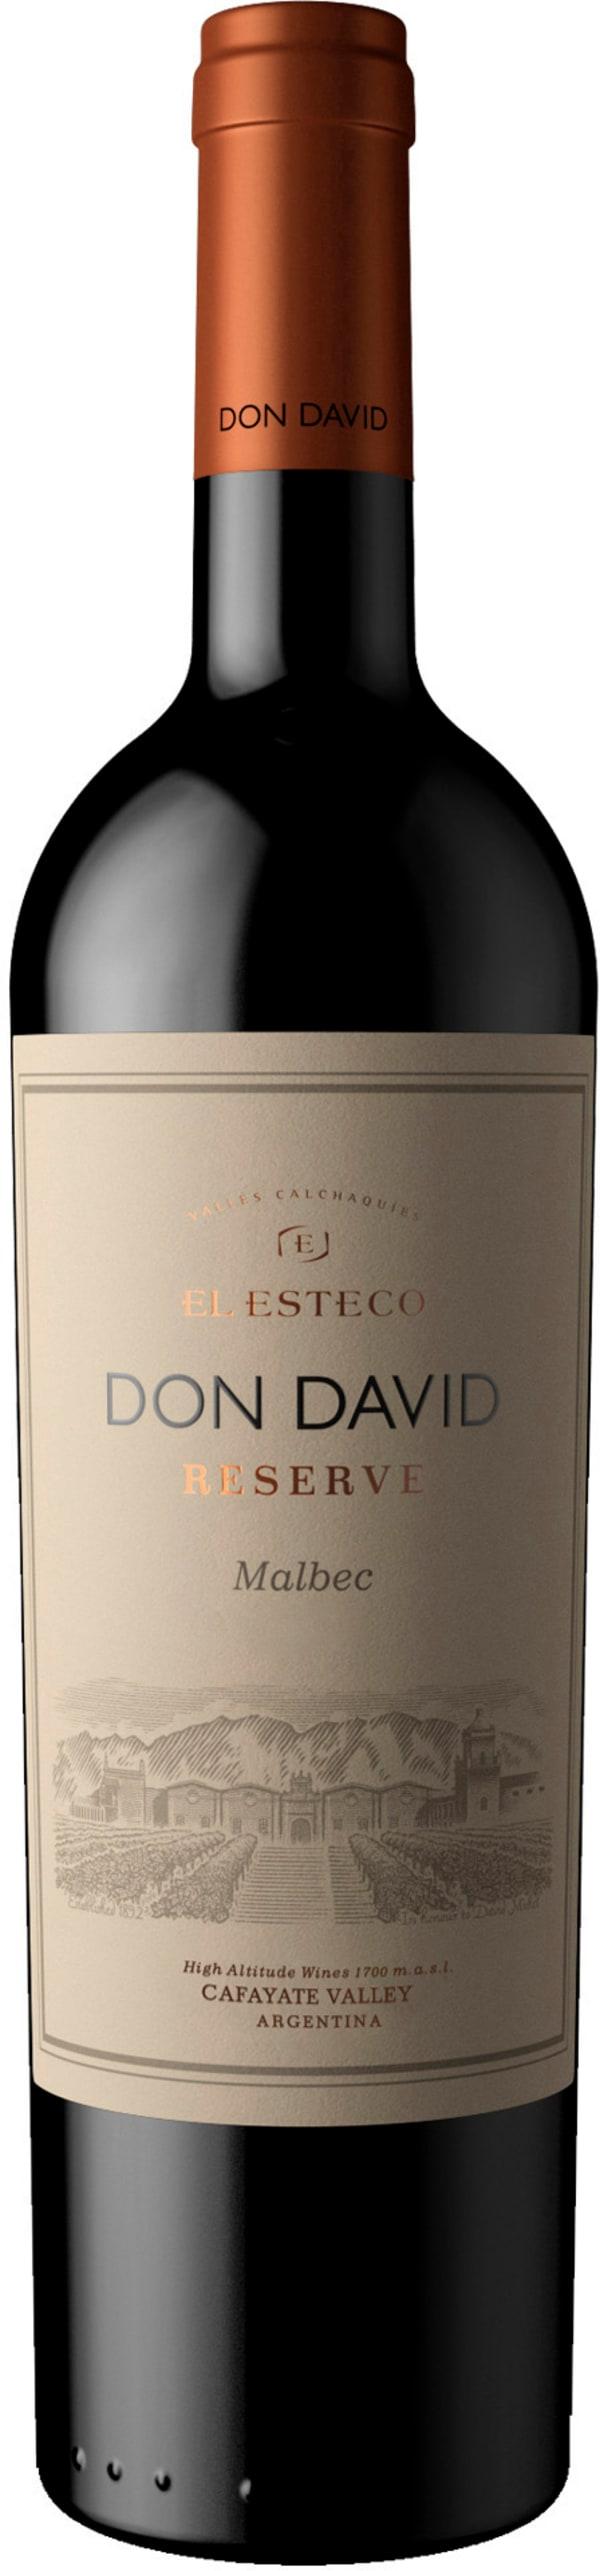 Don David Malbec Reserve 2018